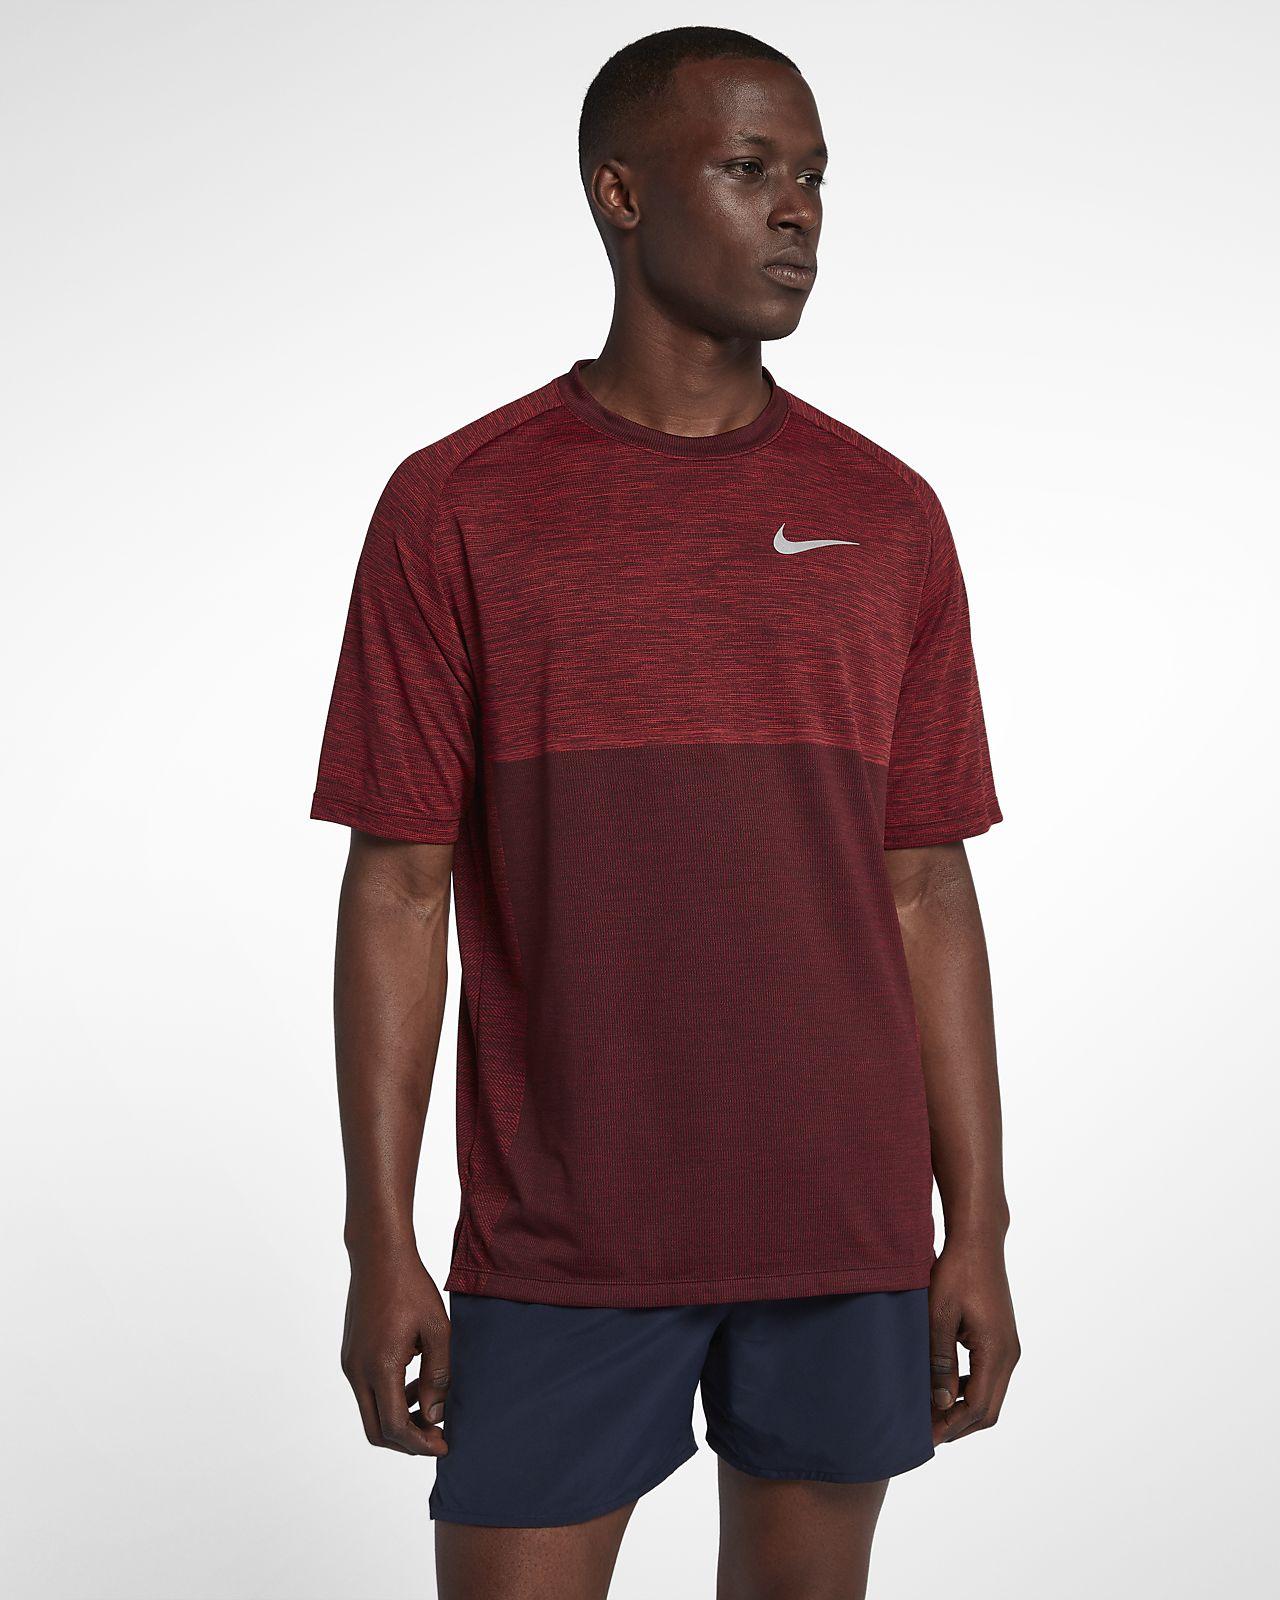 cf77f174 Nike Dri-FIT Medalist Men's Short-Sleeve Running Top. Nike.com IE